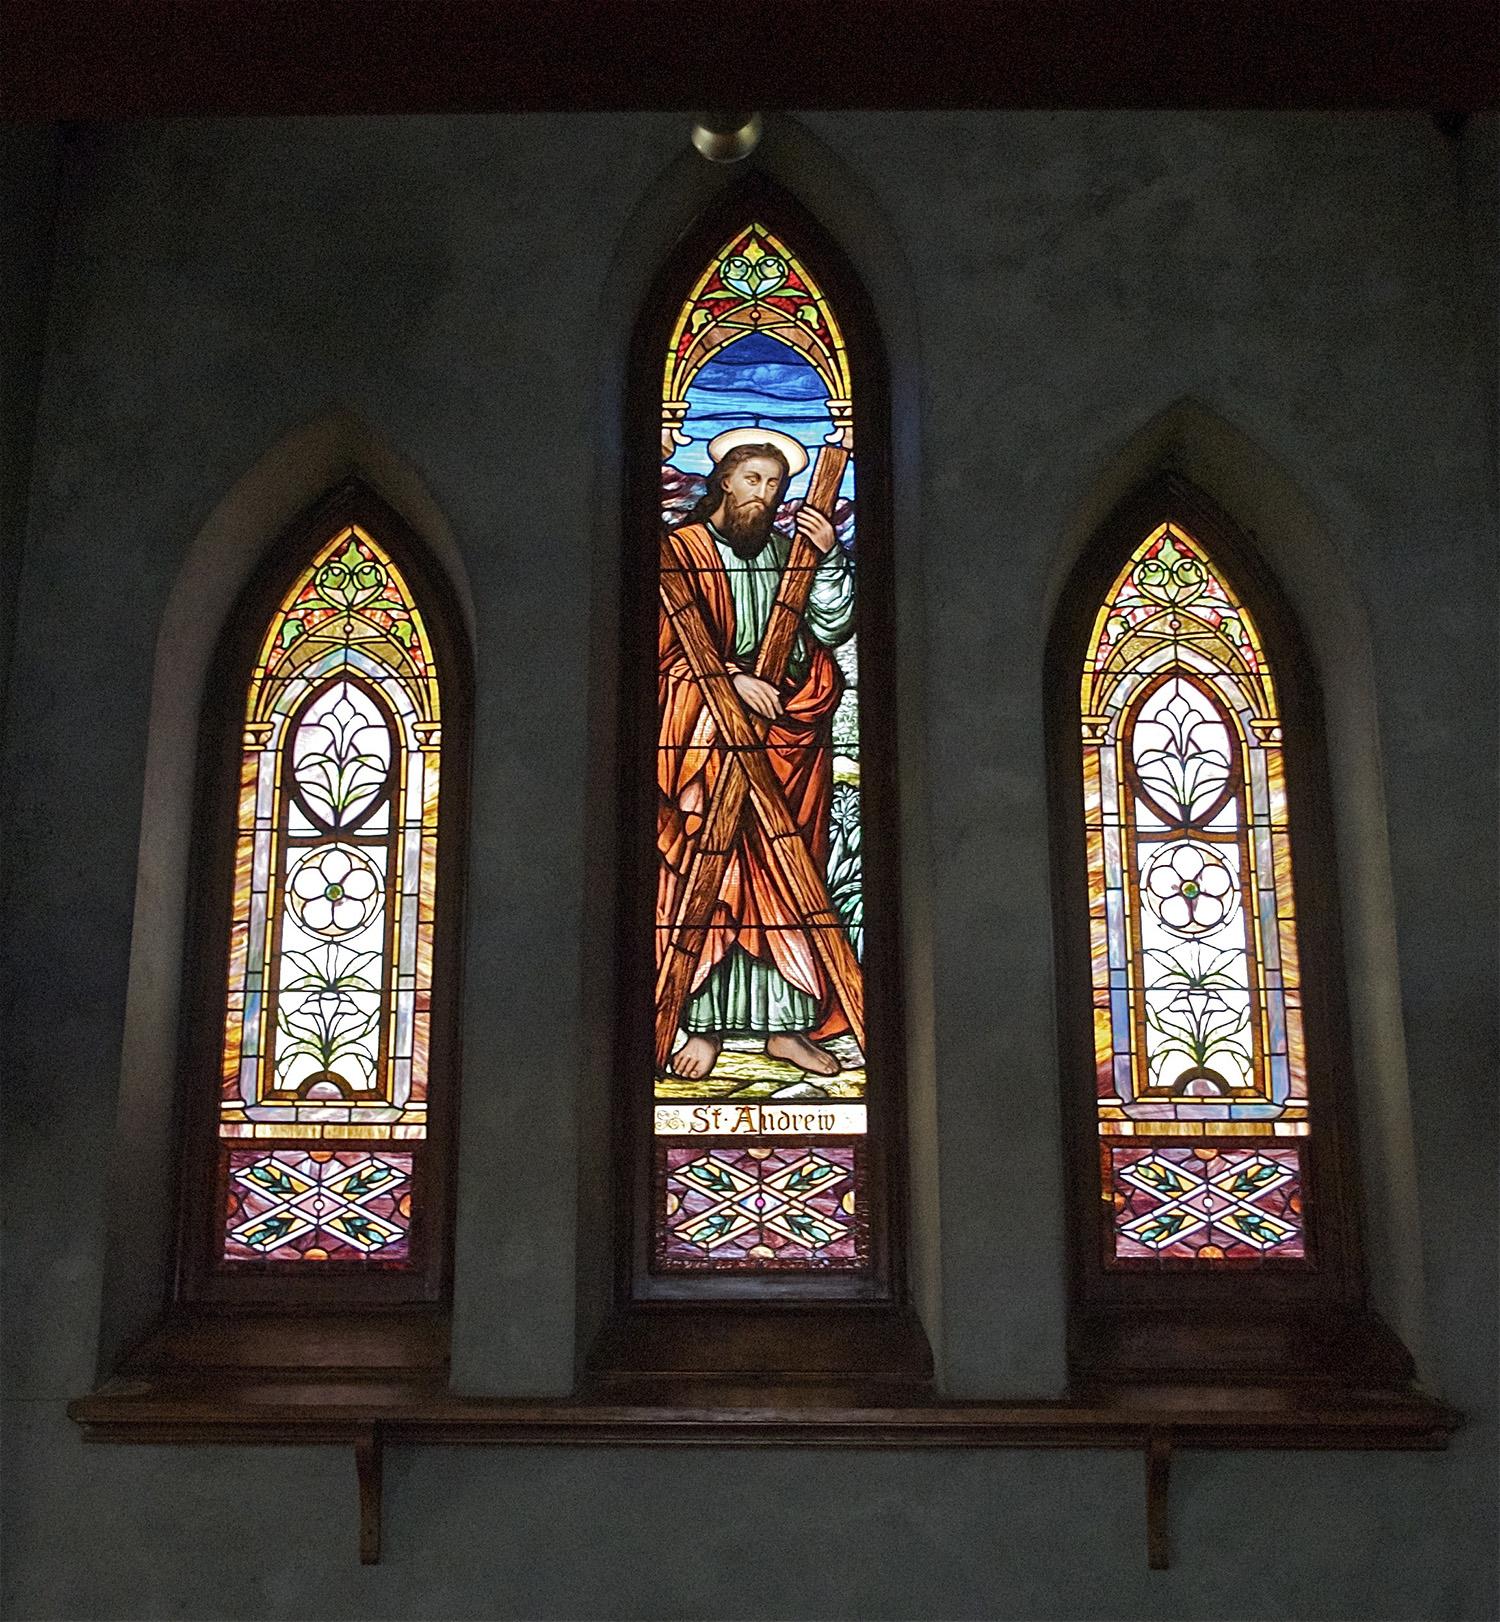 St. Andrew's - Mt. Washington, Ma.